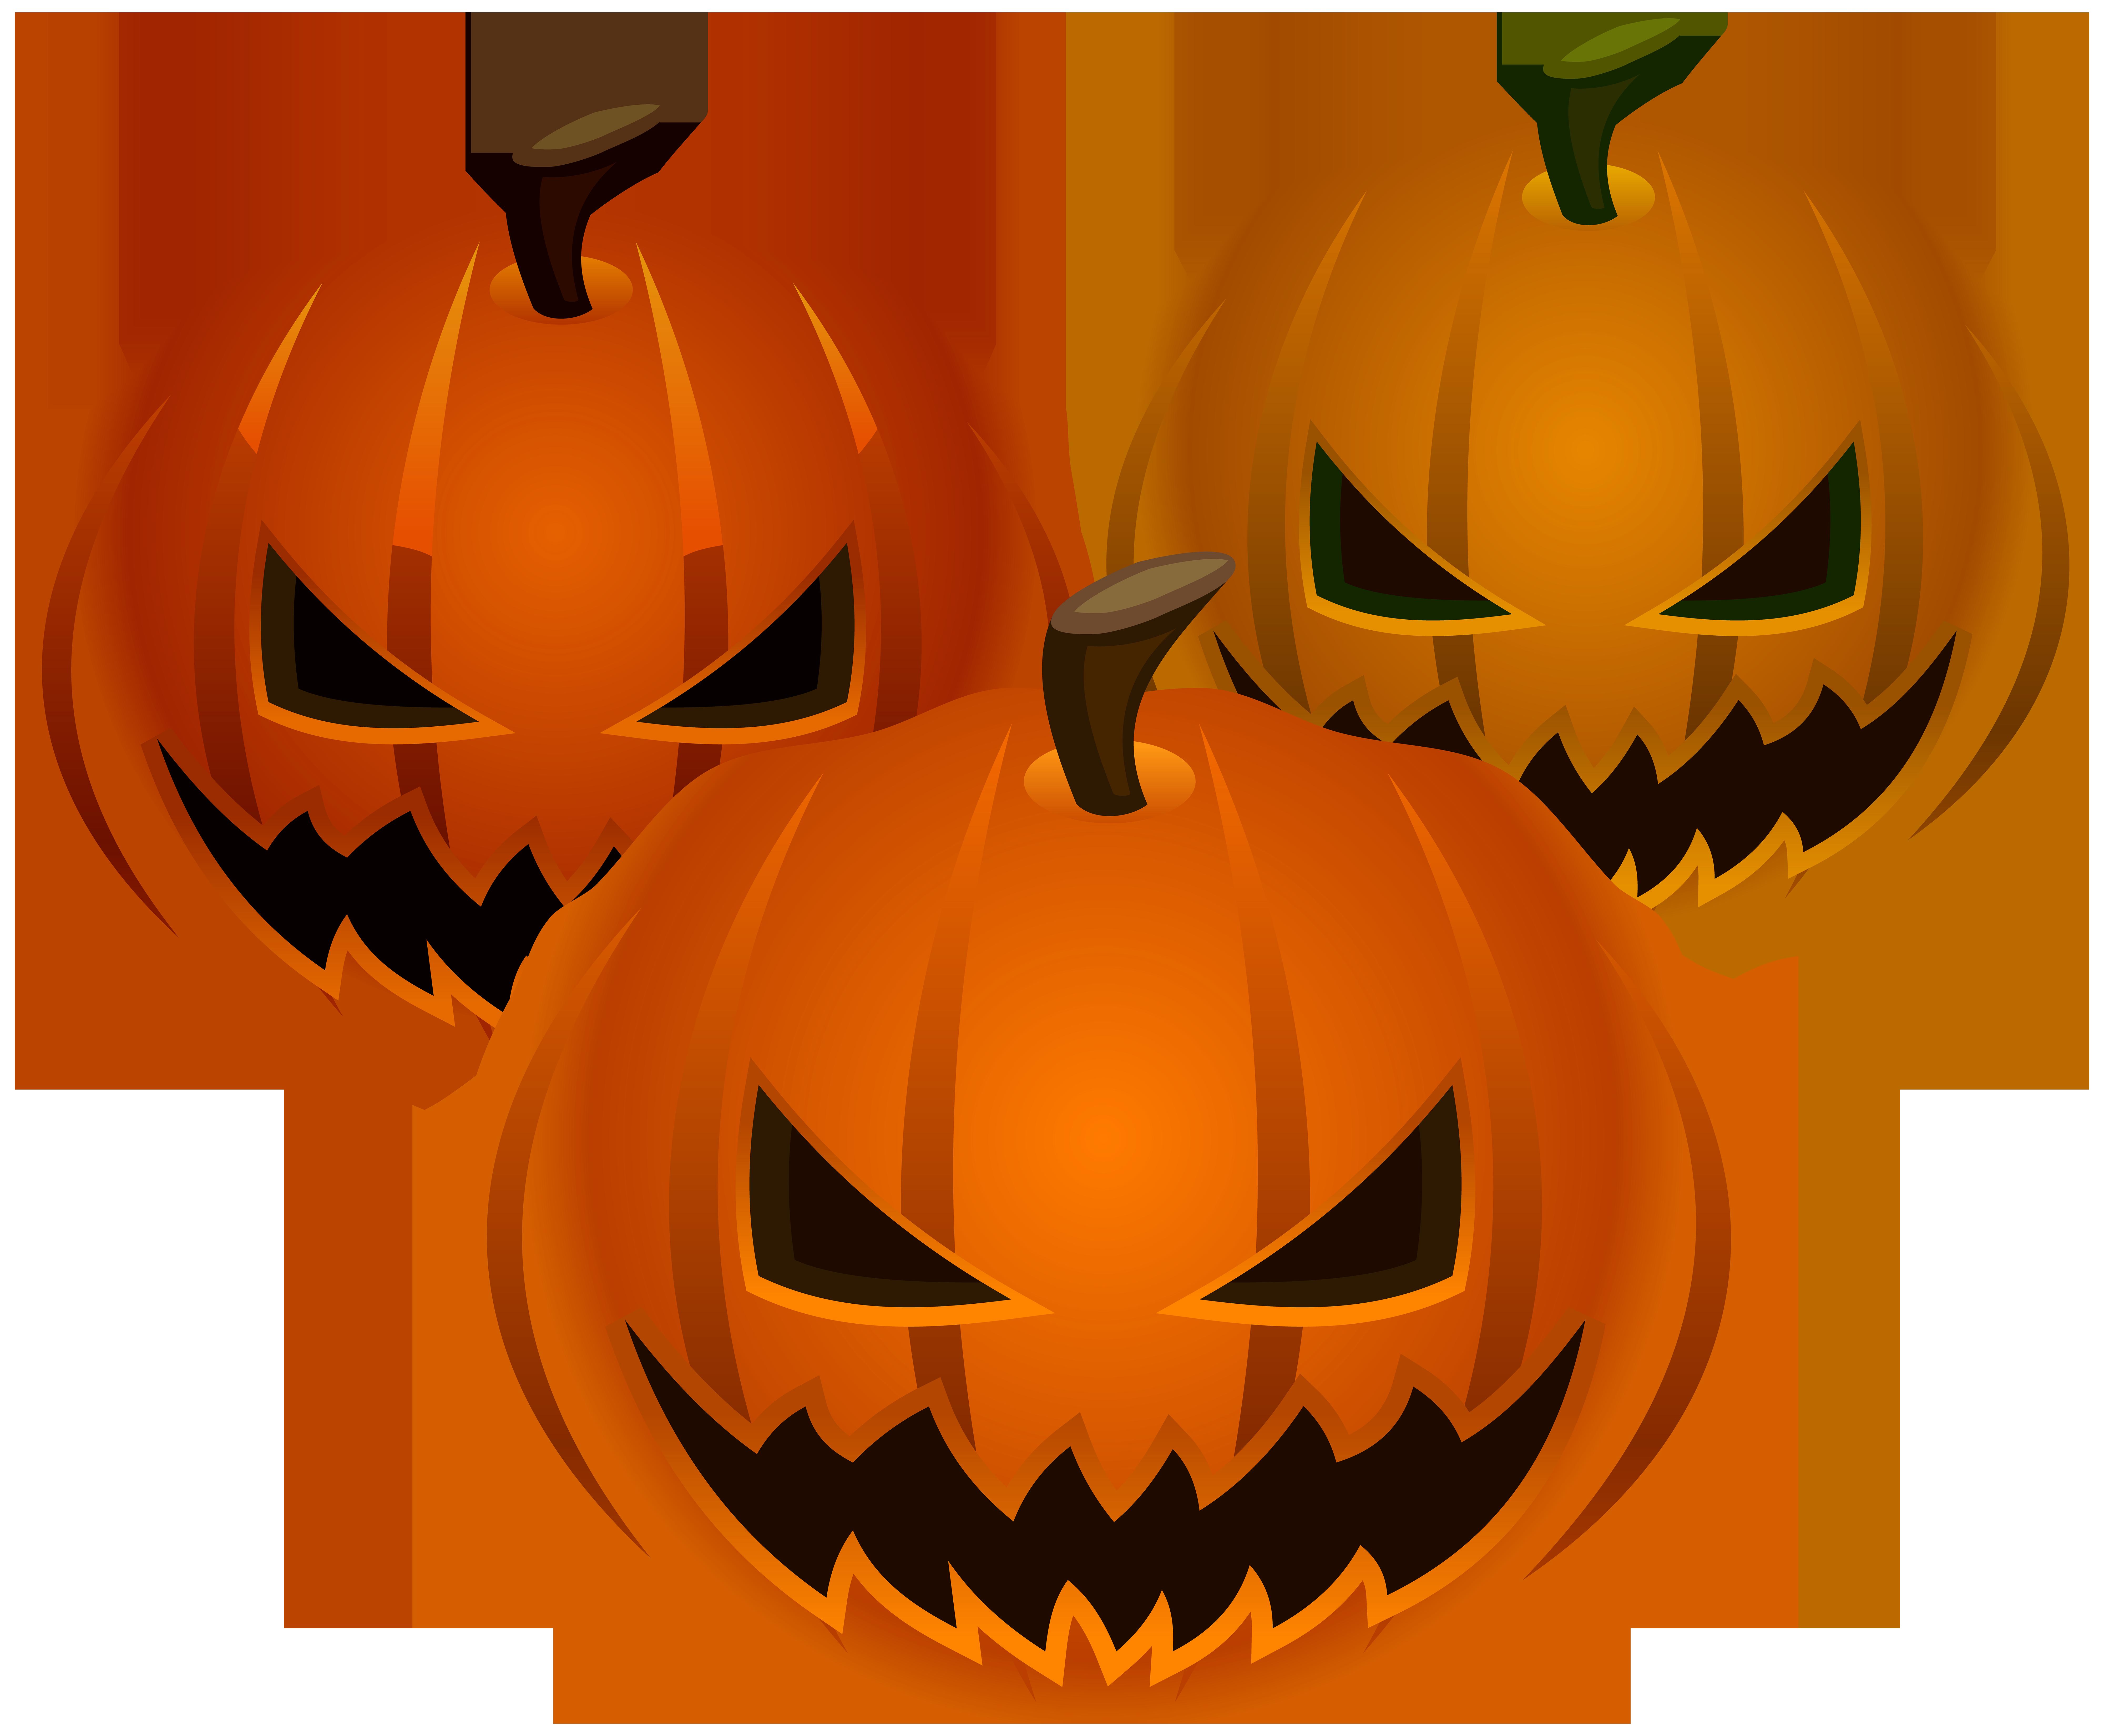 Halloween Pumpkins PNG Clip Art Image.